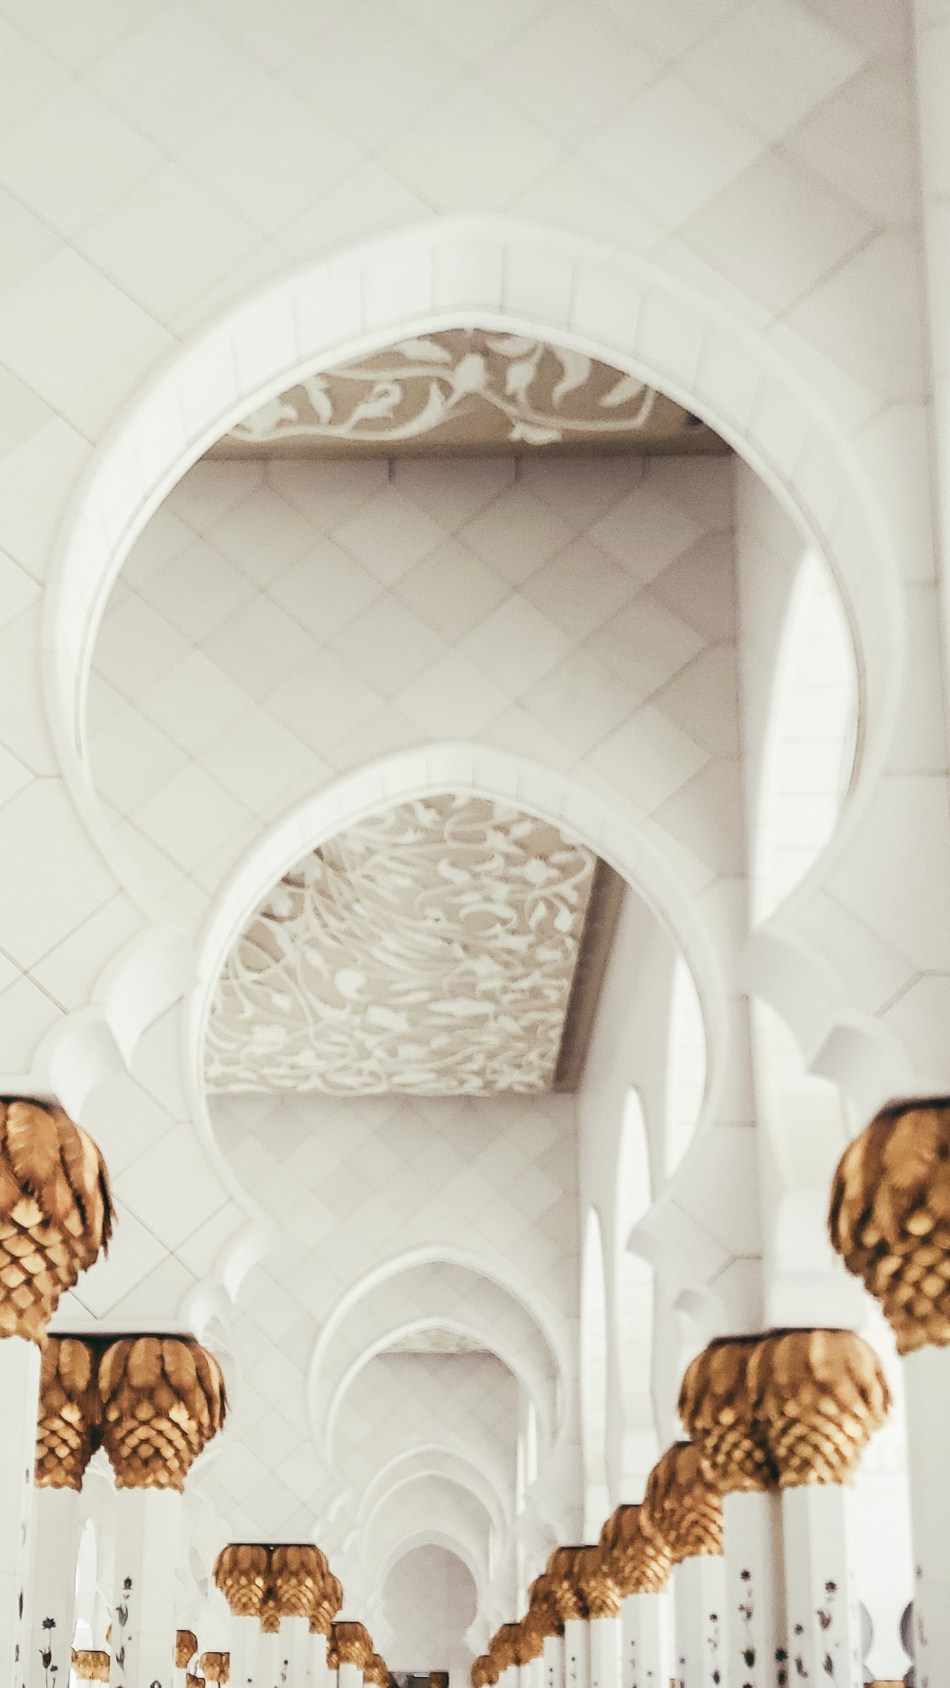 The Moorish archways of  Sheikh Zayed Grand Mosque